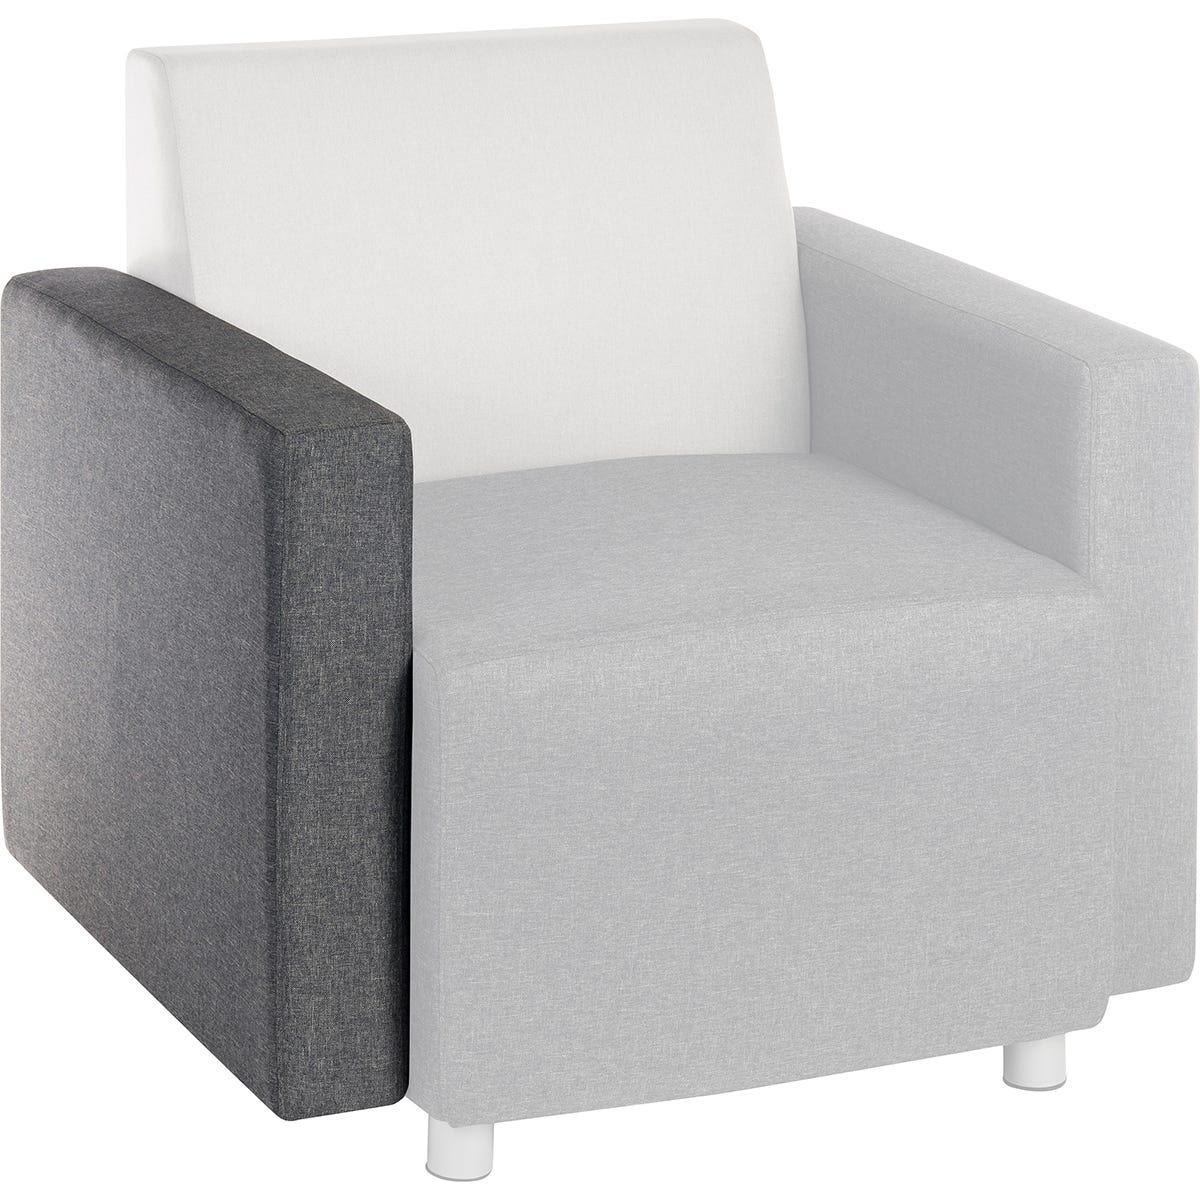 Teknik Cube Modular Reception Sofa - Dark Grey Interchangeable Chair Arm